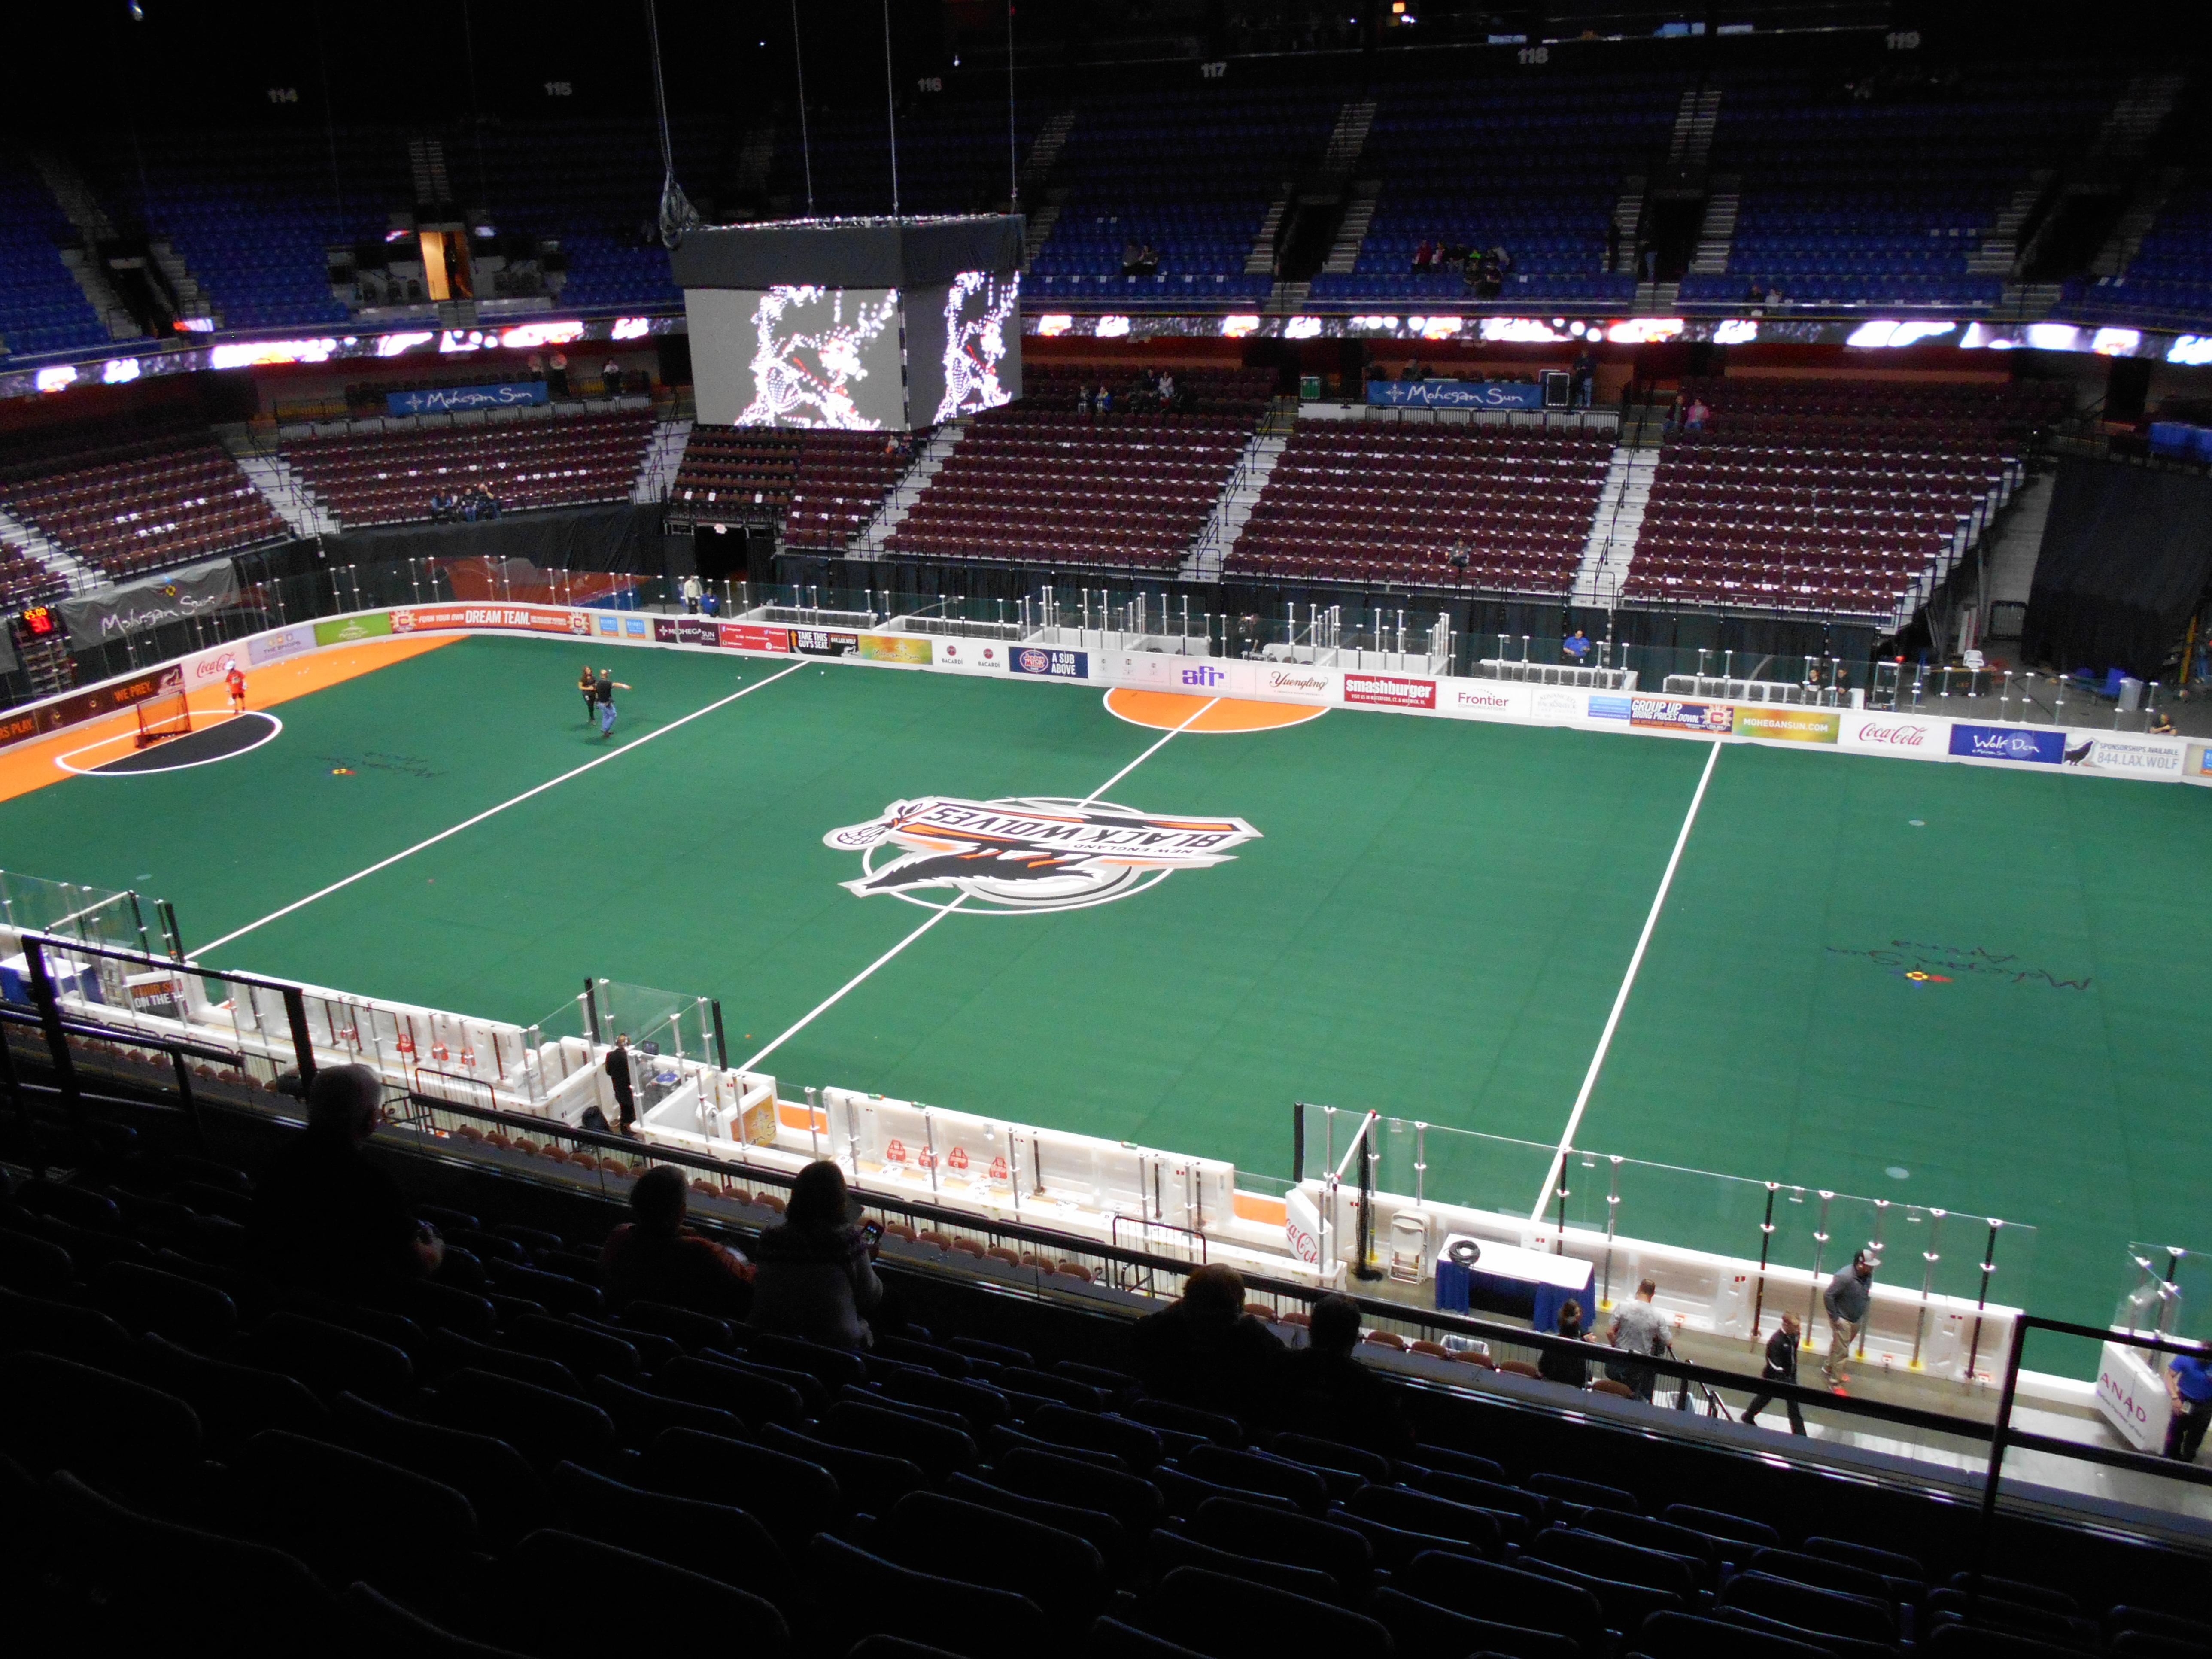 Mohegan Sun Arena Section 105 Row H Seat 8